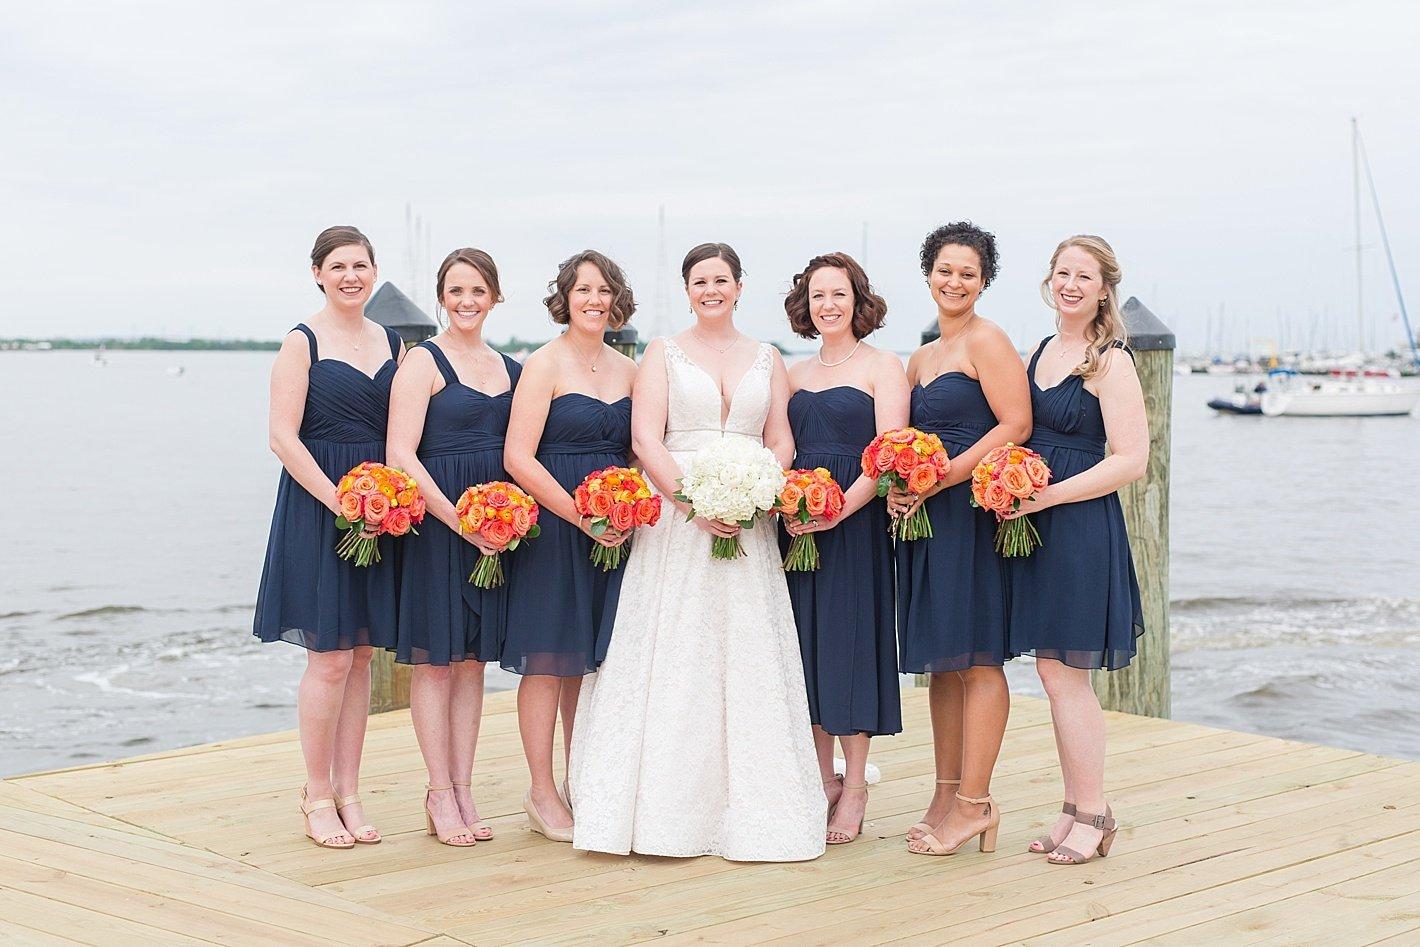 Navy bridesmaid dresses Jenny Yoo dresses peach bouquets